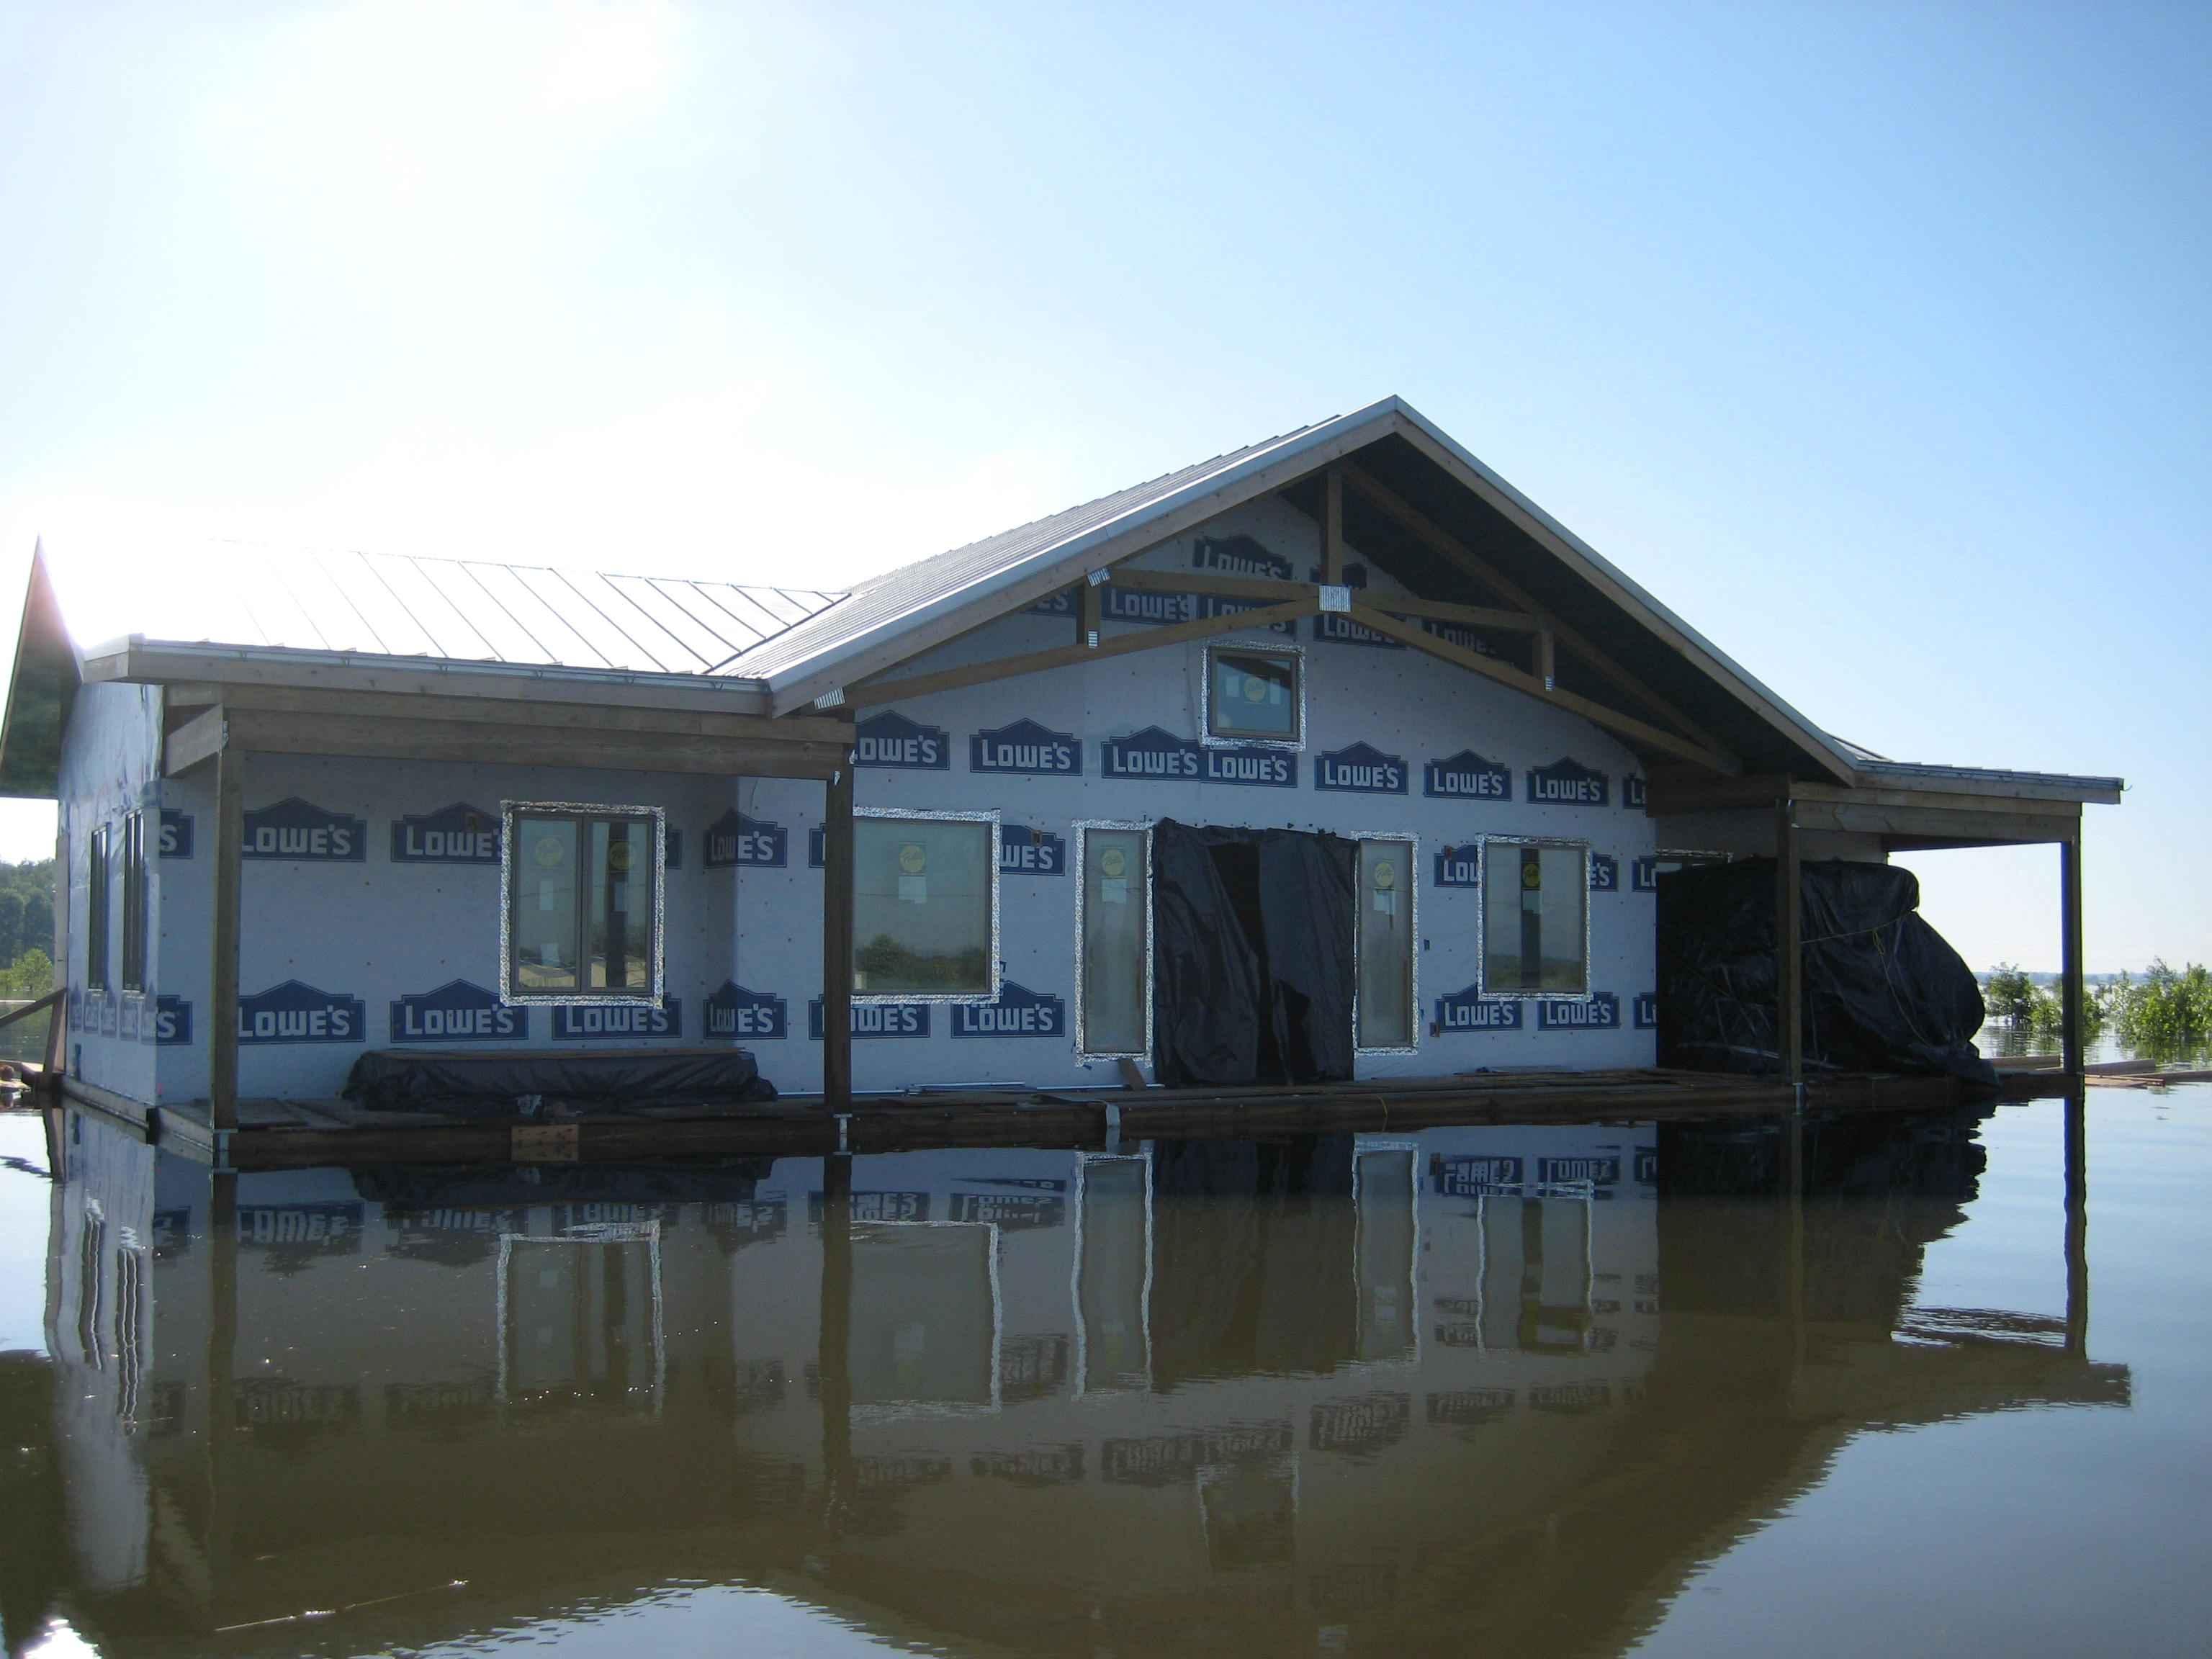 File:House flood.jpg - Wikimedia Commons